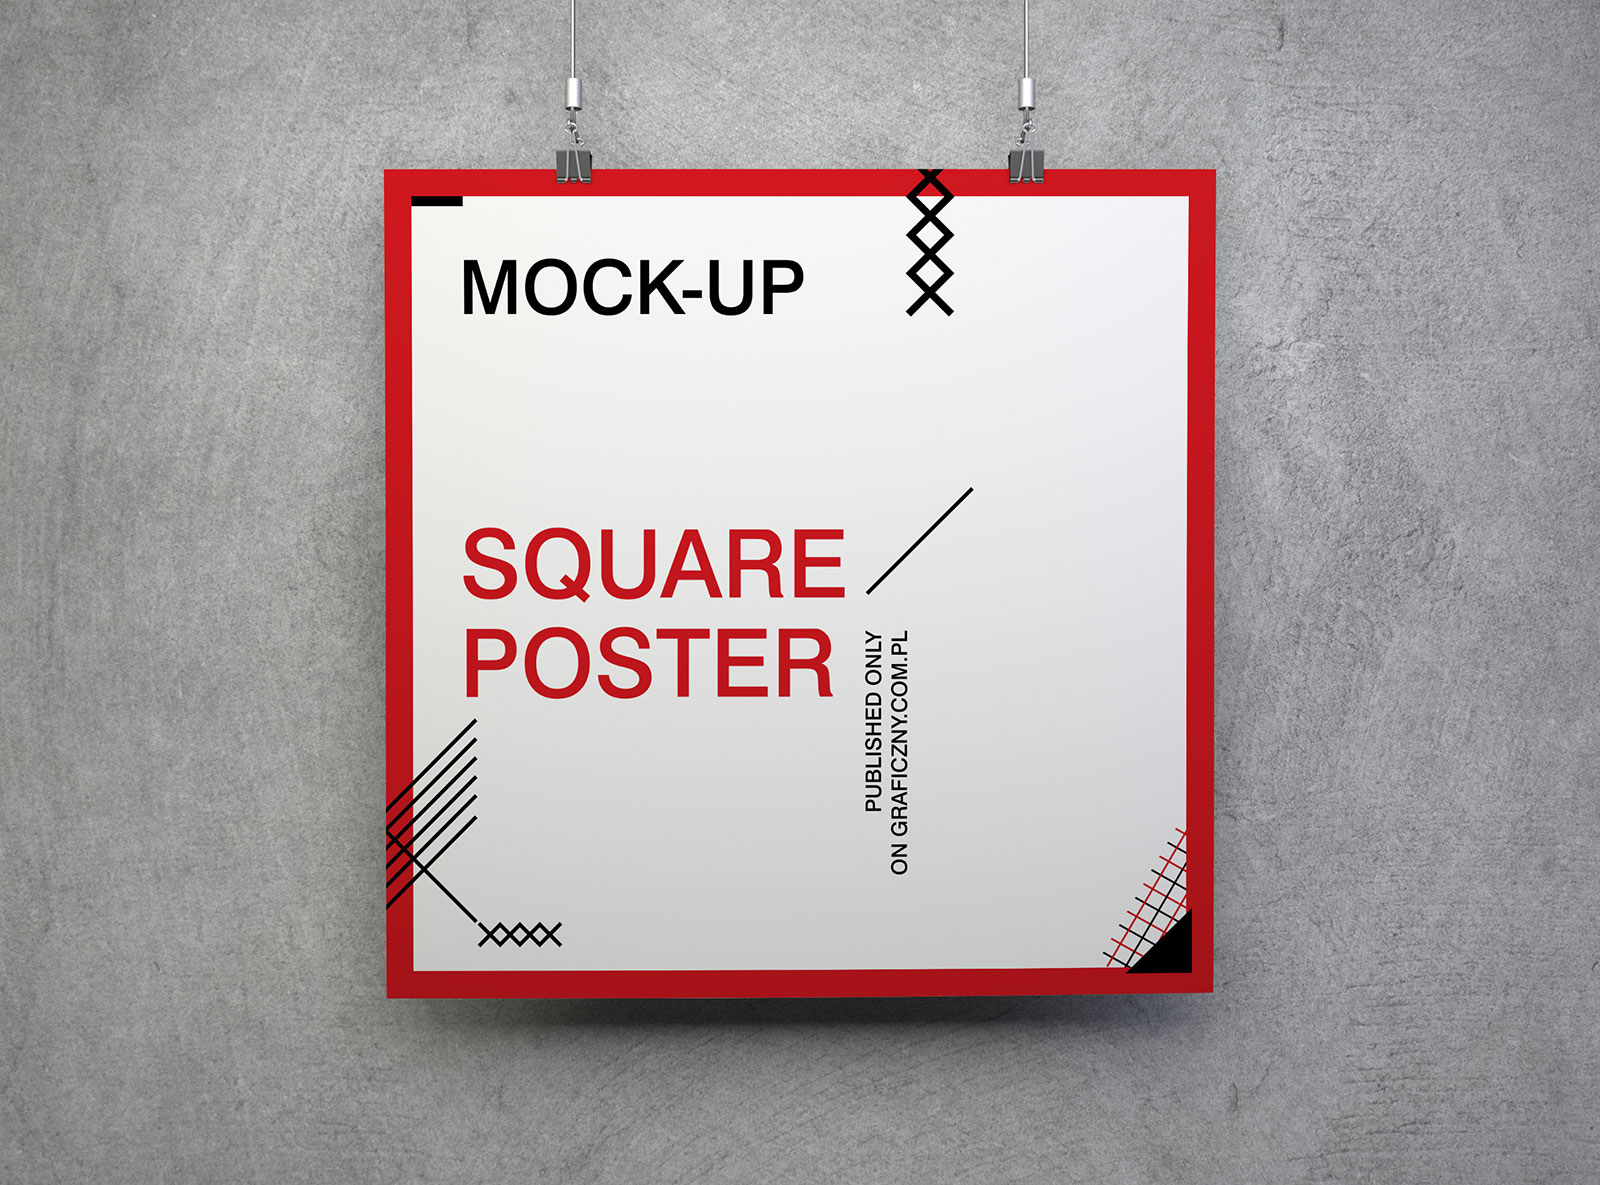 Free-Square-Poster-Mockup-PSD